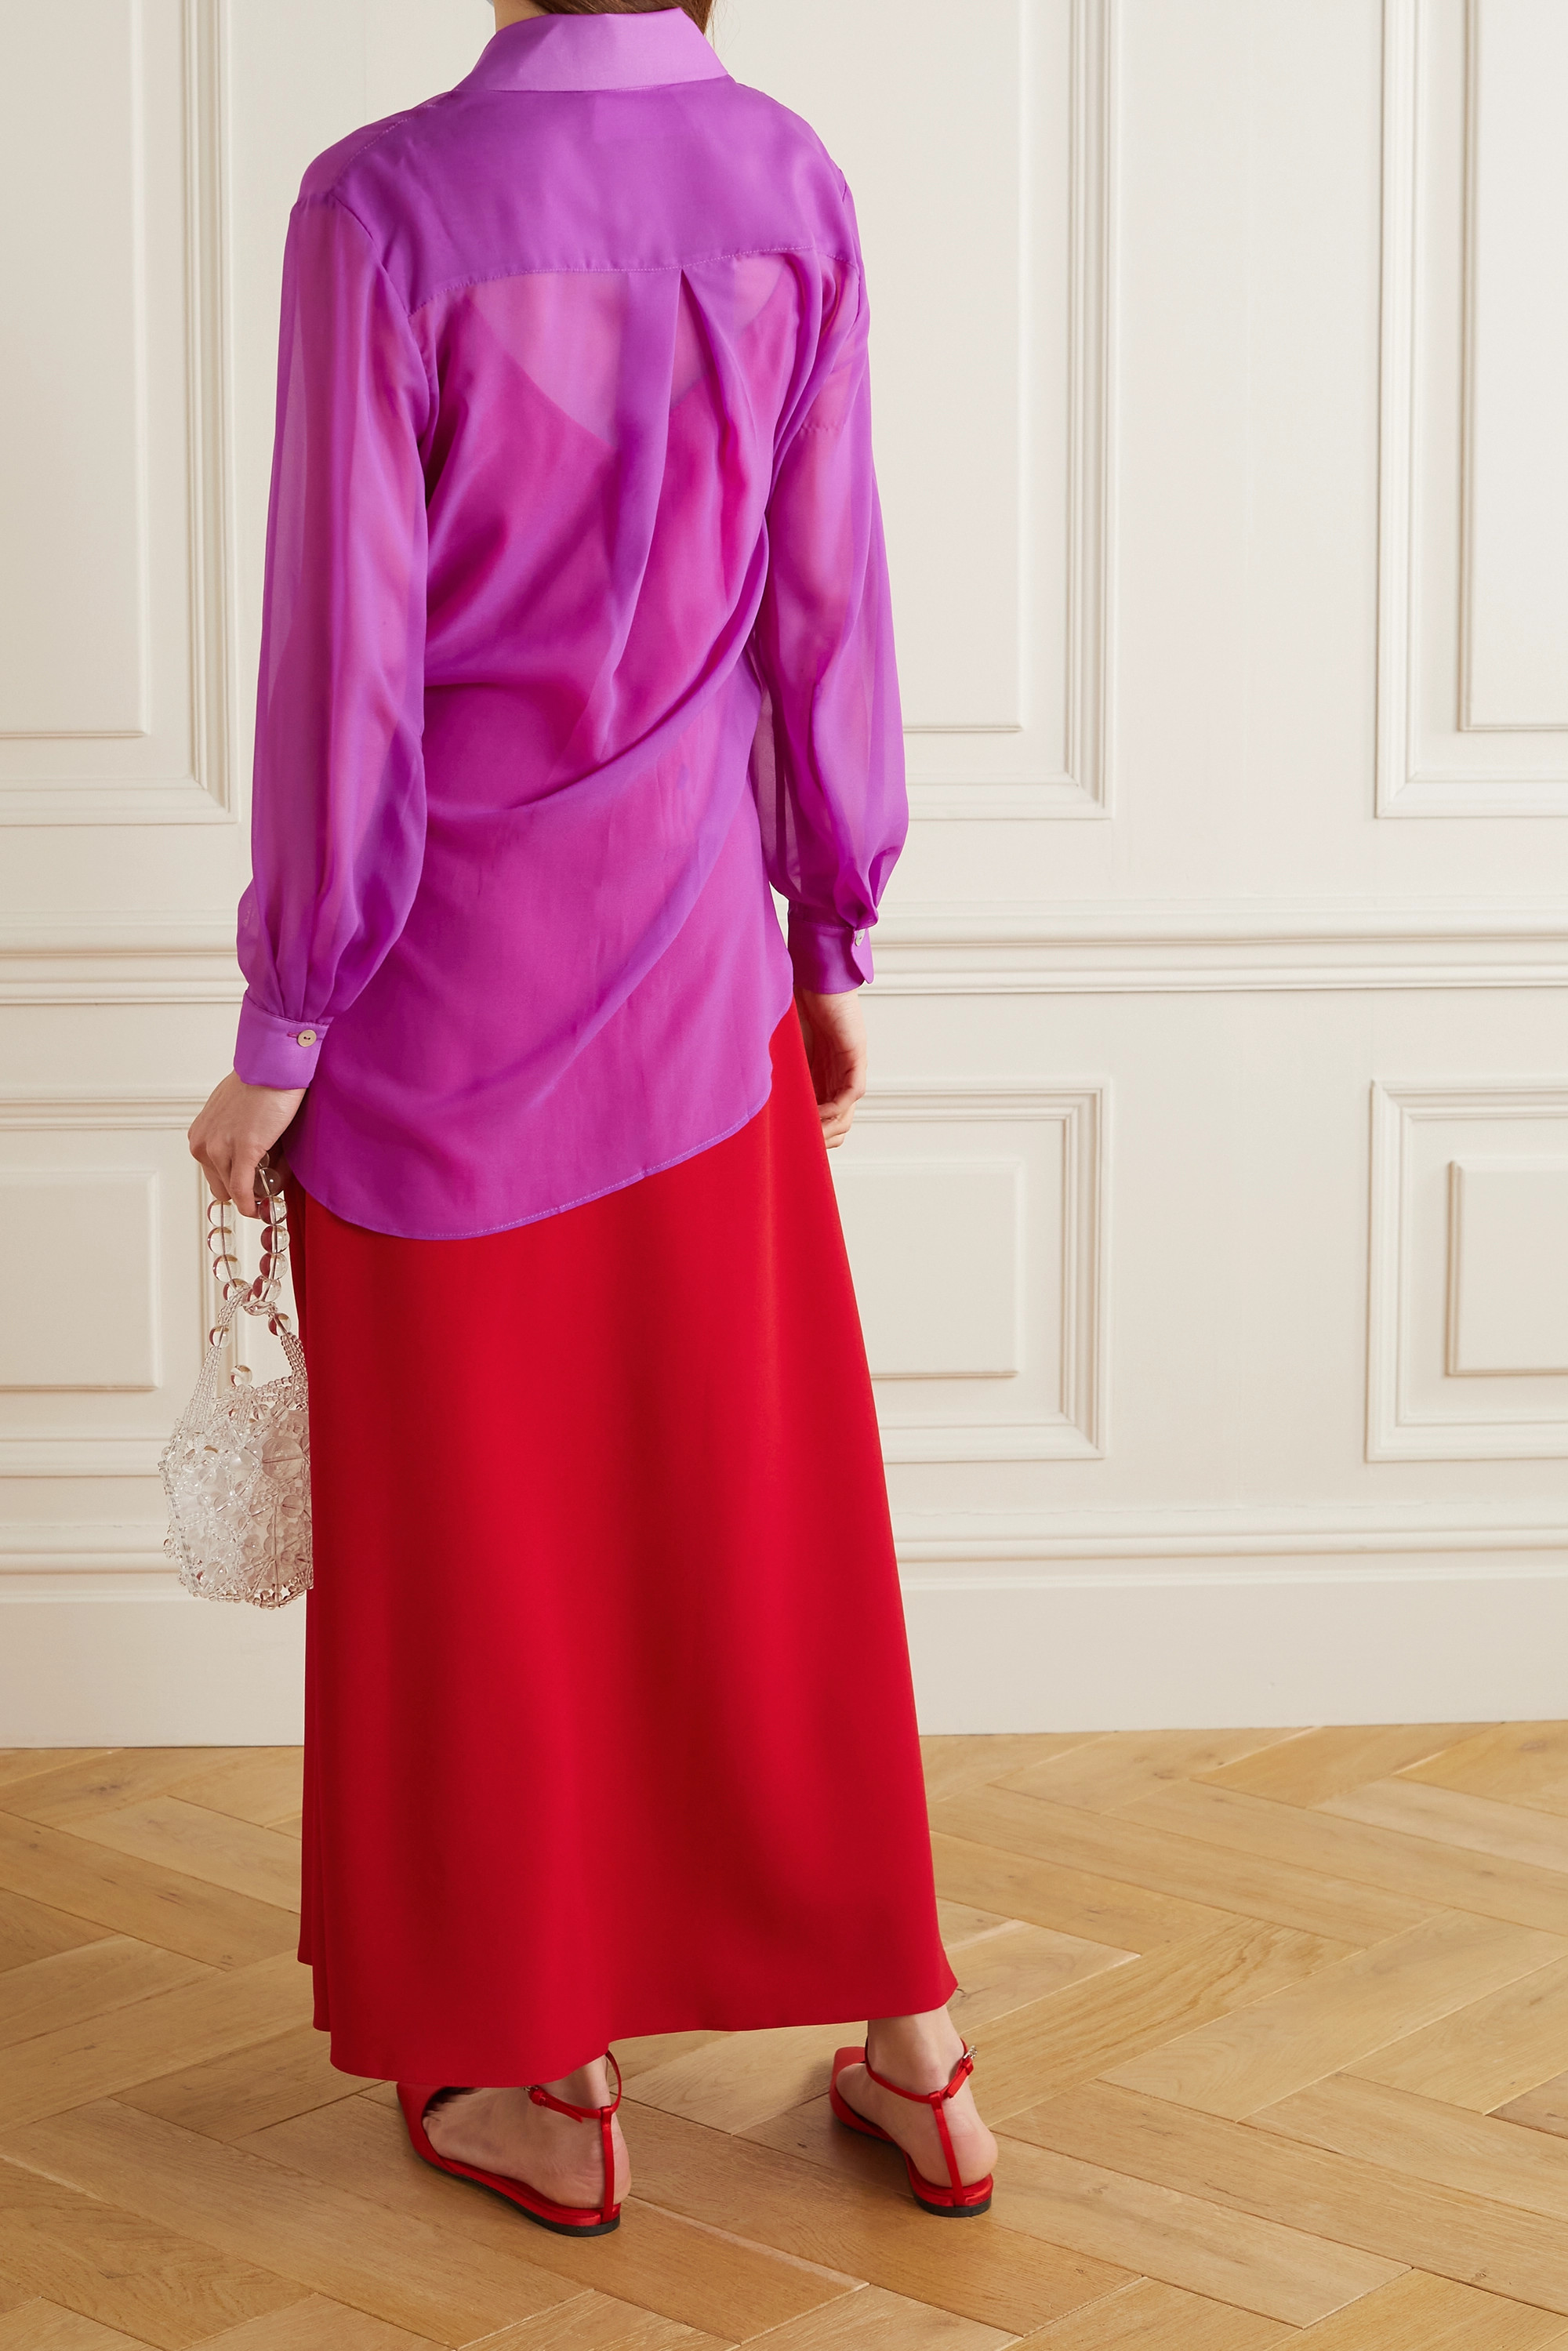 Racil Alaya Set aus Hemd aus Chiffon und Kleid aus Crêpe de Chine